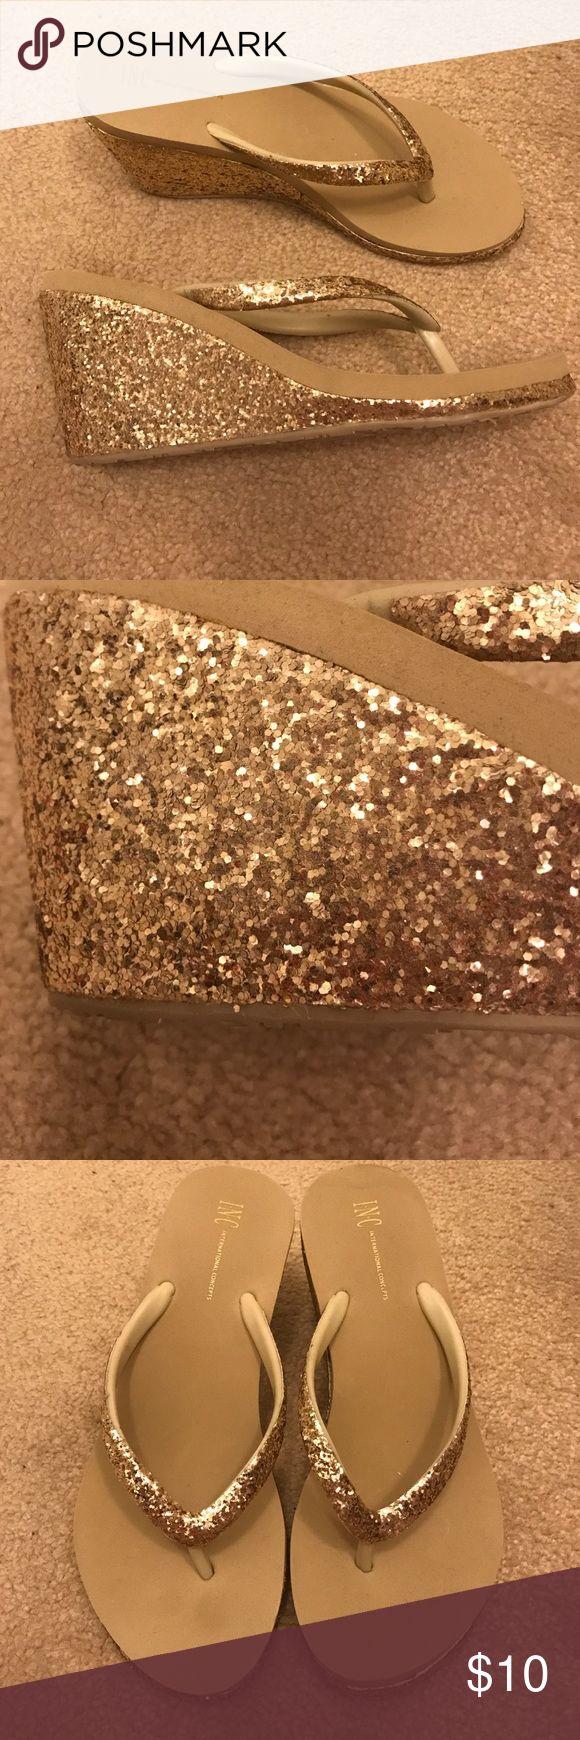 Gold glitter platform flip flops Never worn gold glitter platform flip flops- they're a lot of fun! Shoes